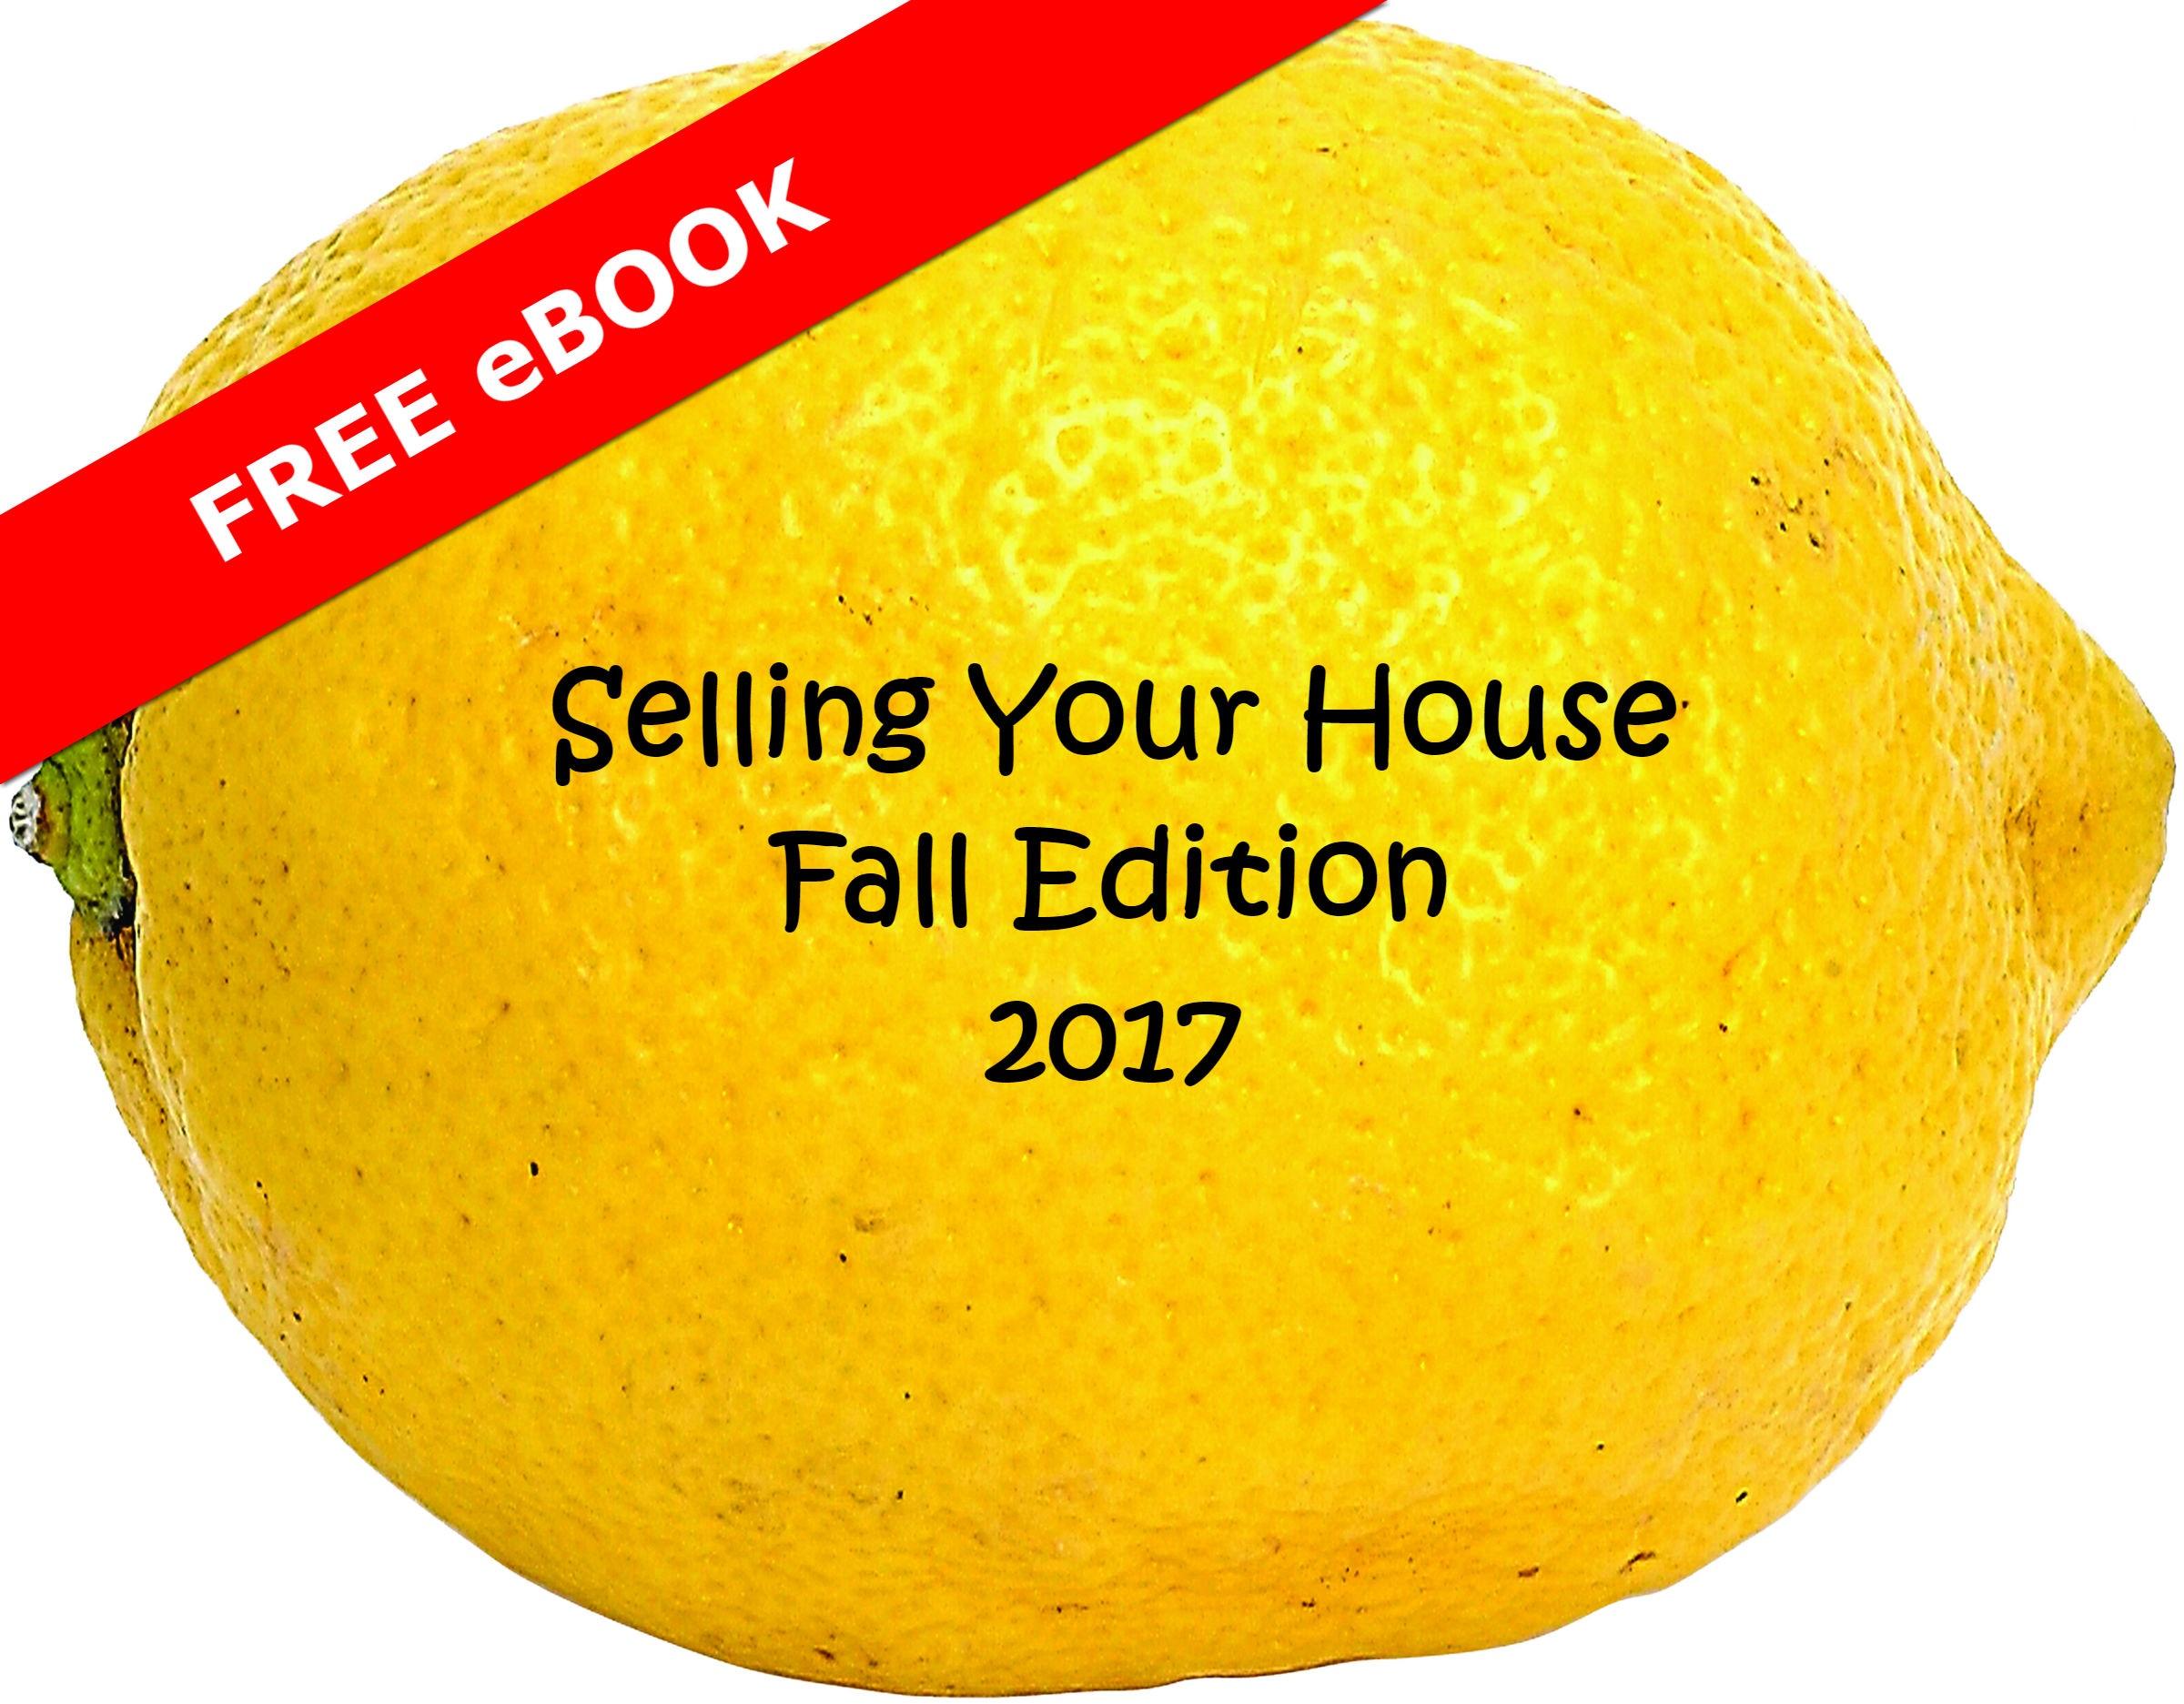 Fall Seller guide eBook